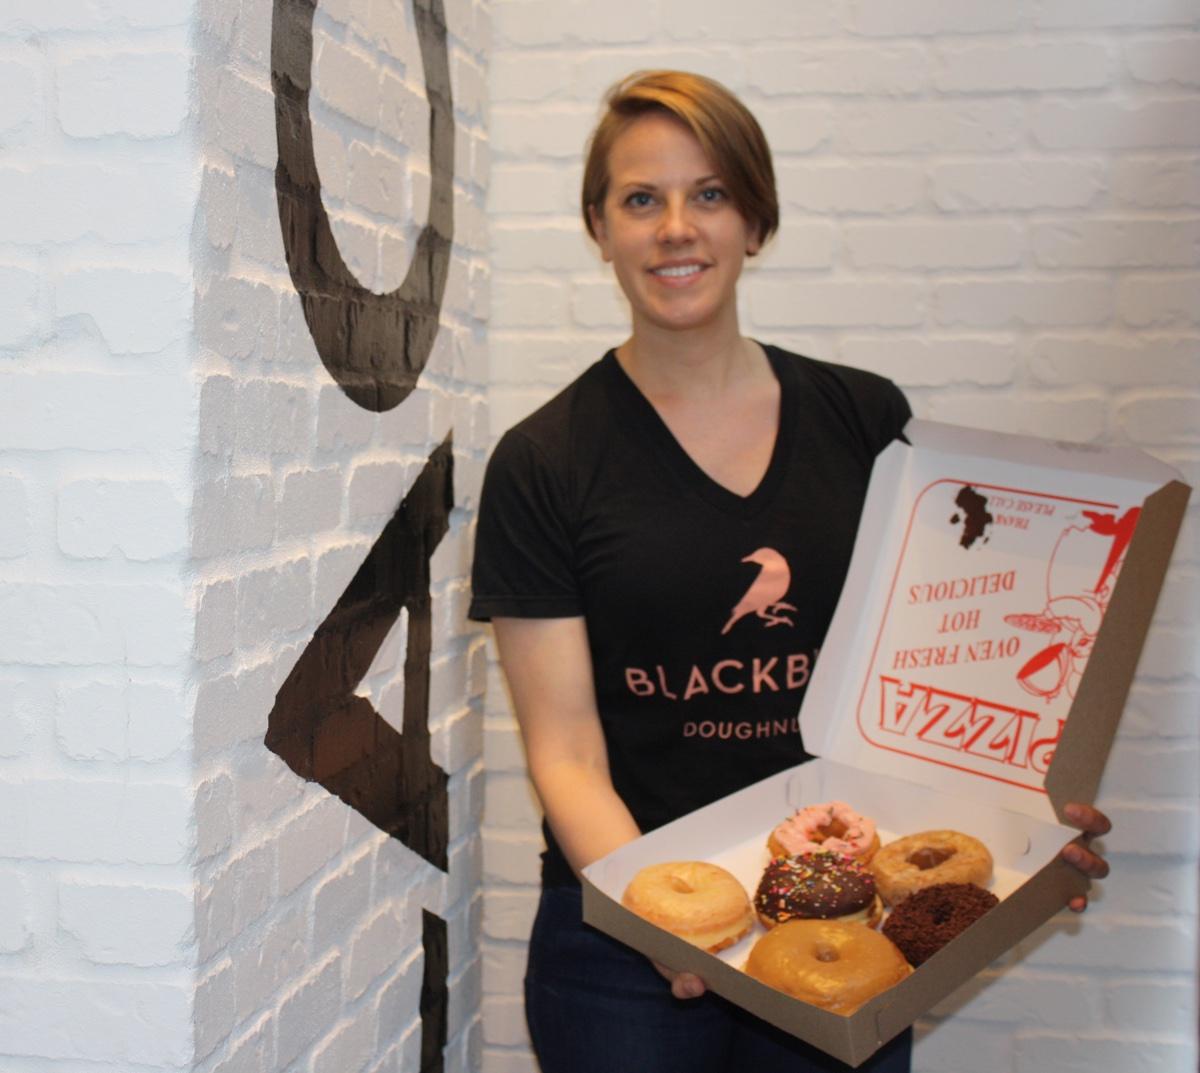 Blackbird Doughnuts chef and partner Anna Perna